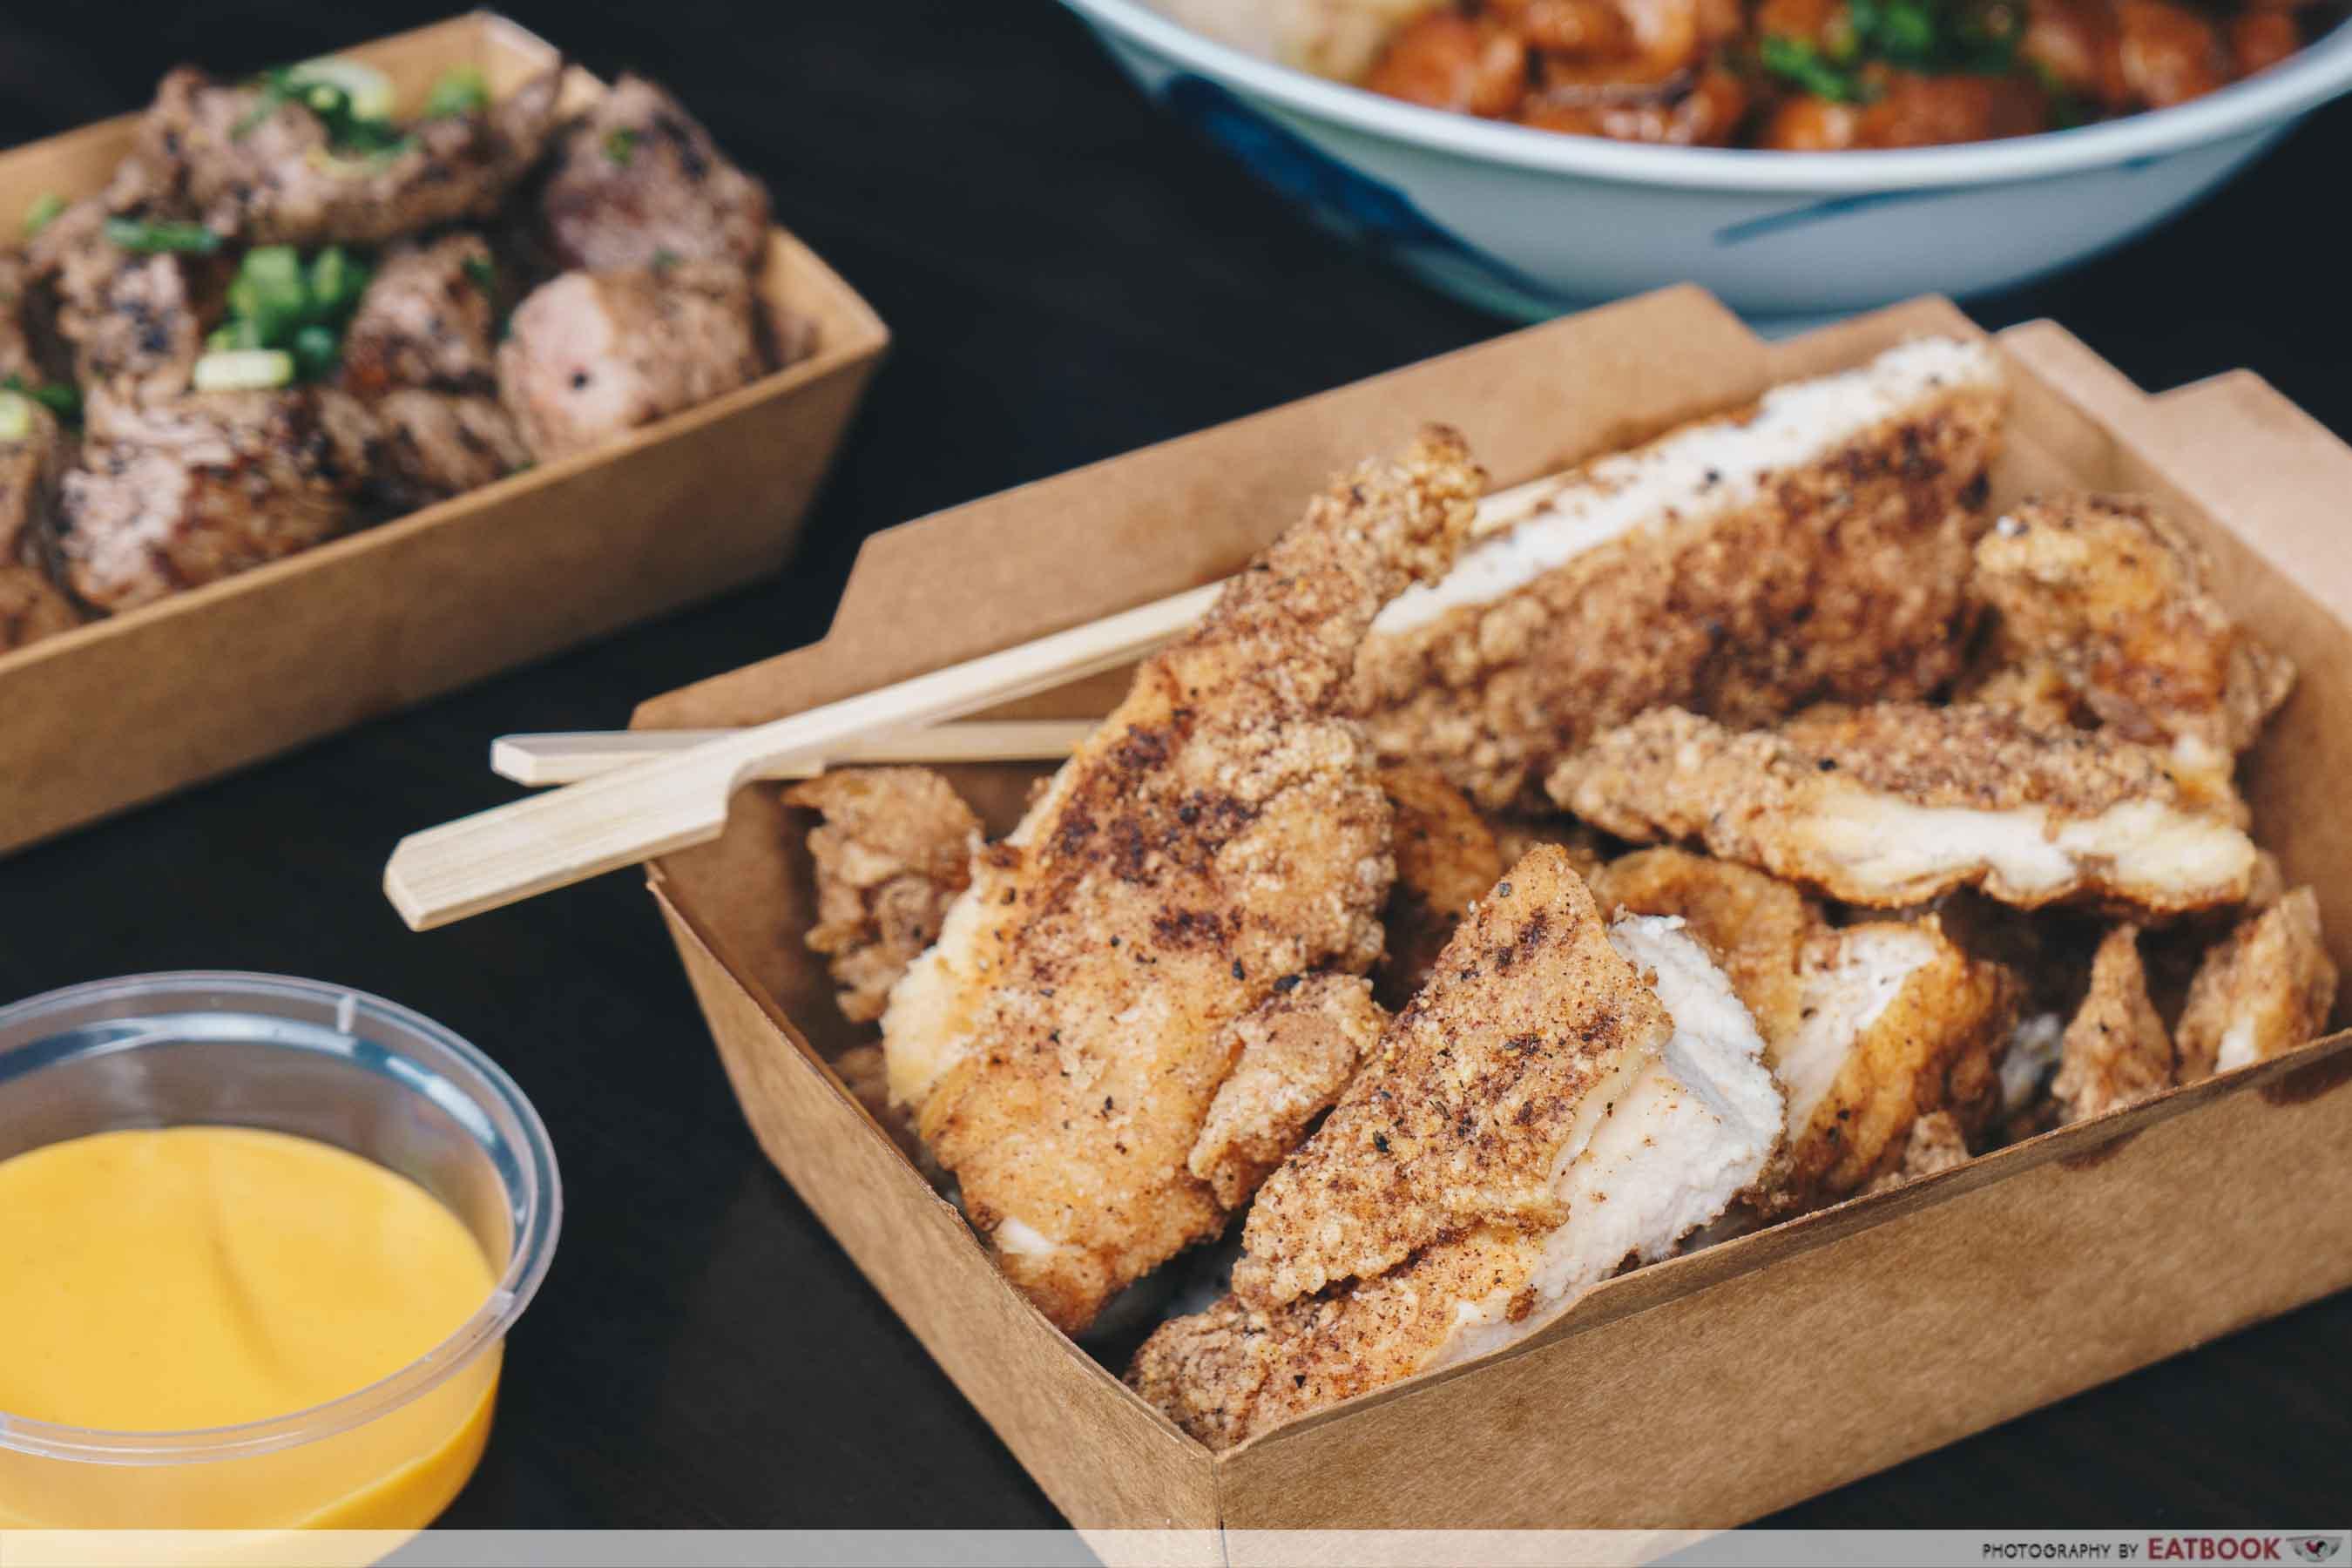 YEAH Taiwanese Modern Street Food XXXL Chicken Steak